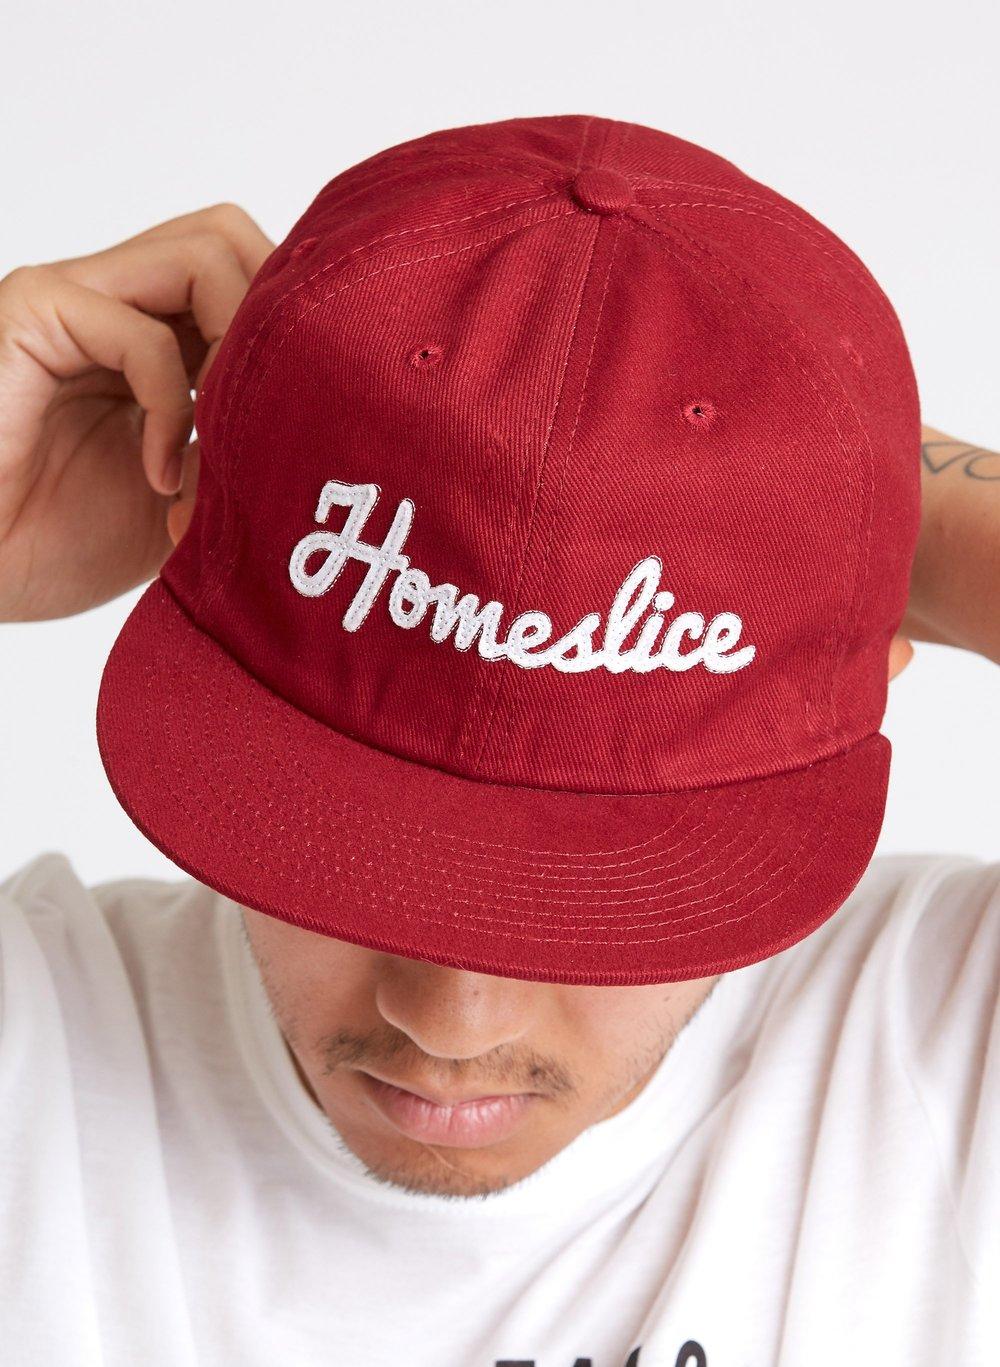 $34.99 HOMESLICE STRAPBACK HAT